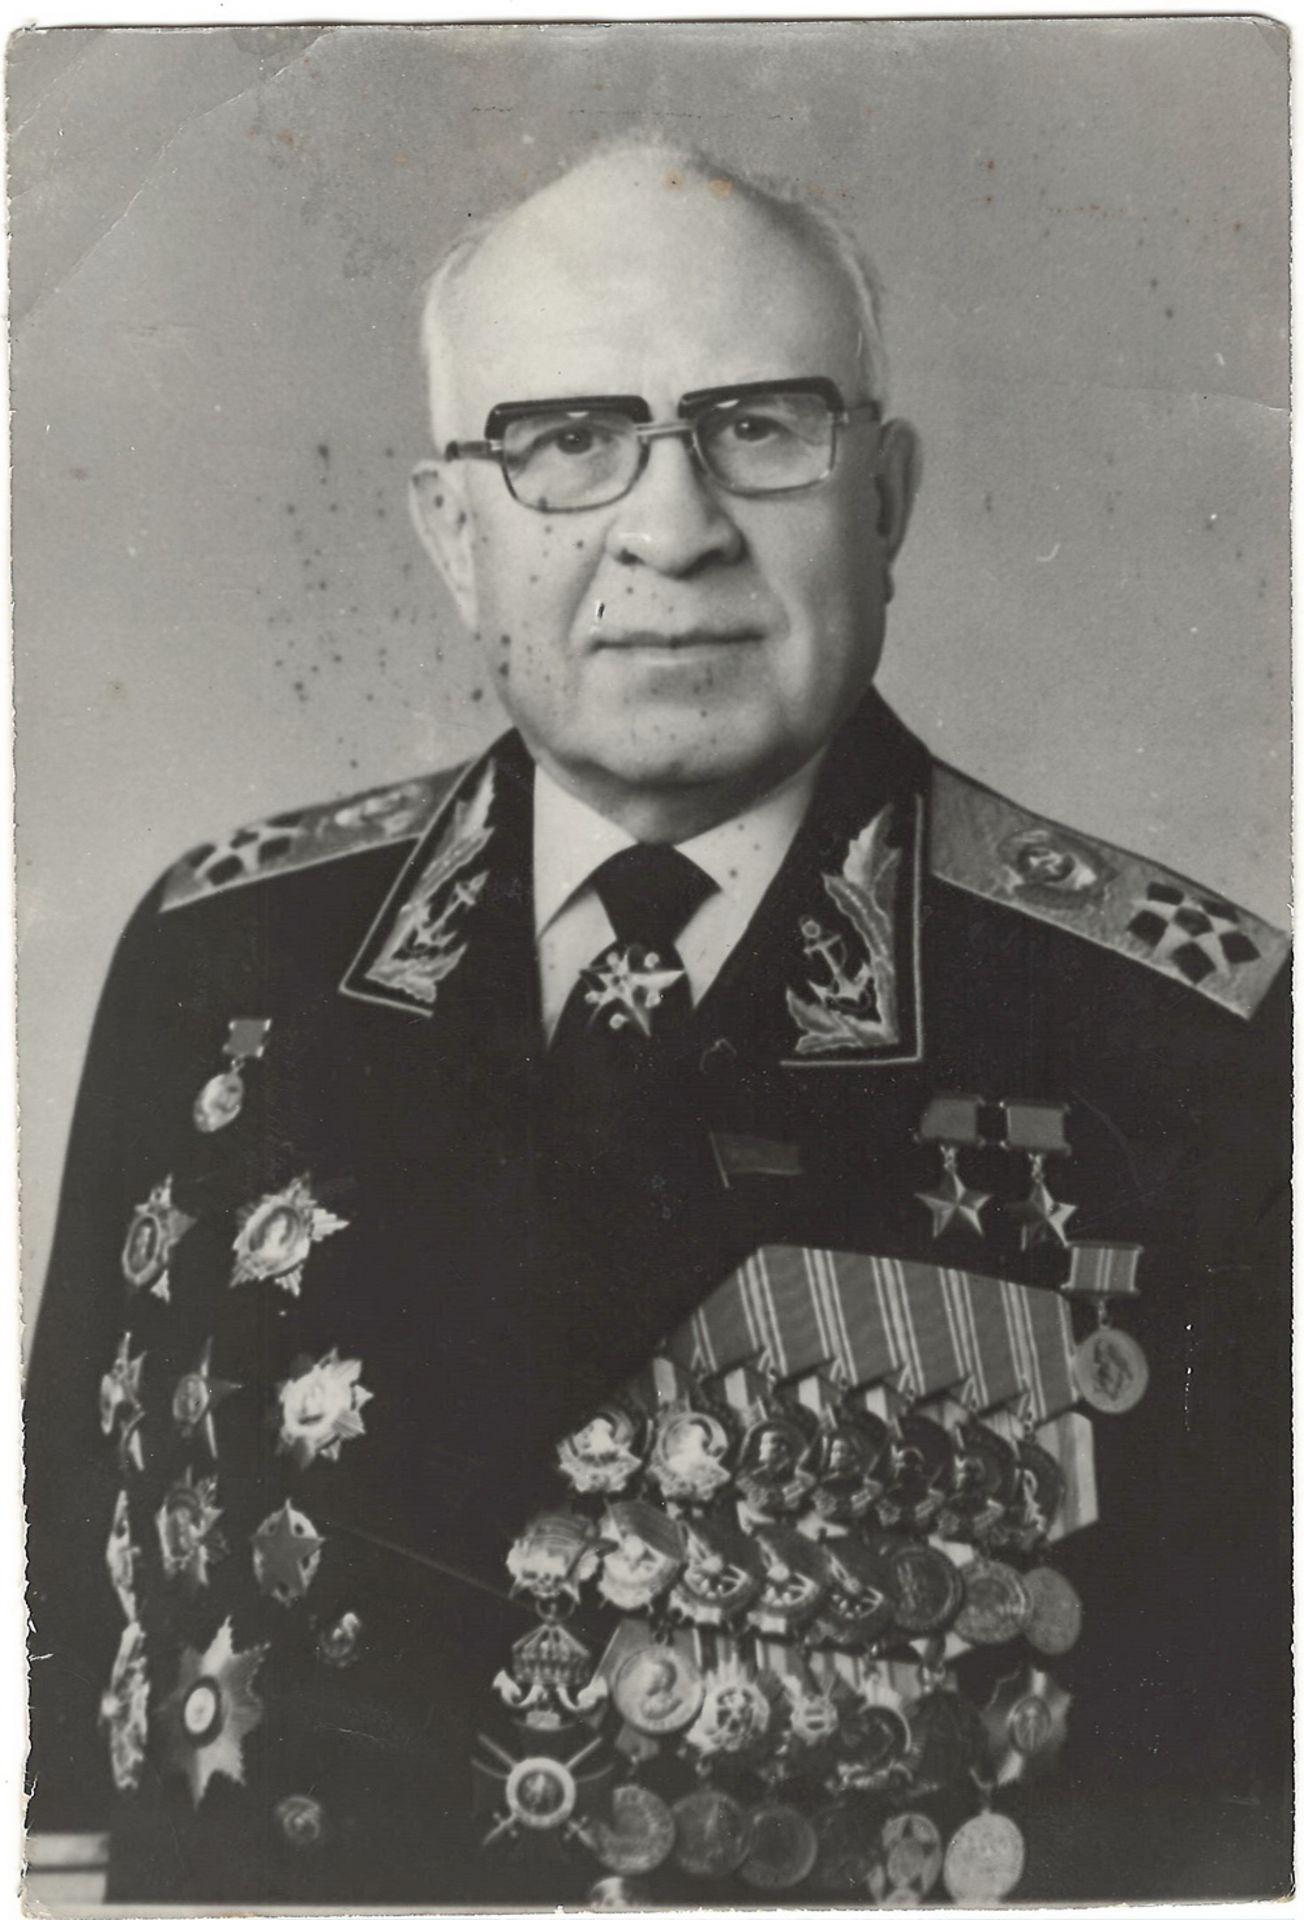 Portrait of admiral of the fleet of the Soviet Union Sergey Gorshkov. Photograph. 1980s.<br>18x12 cm